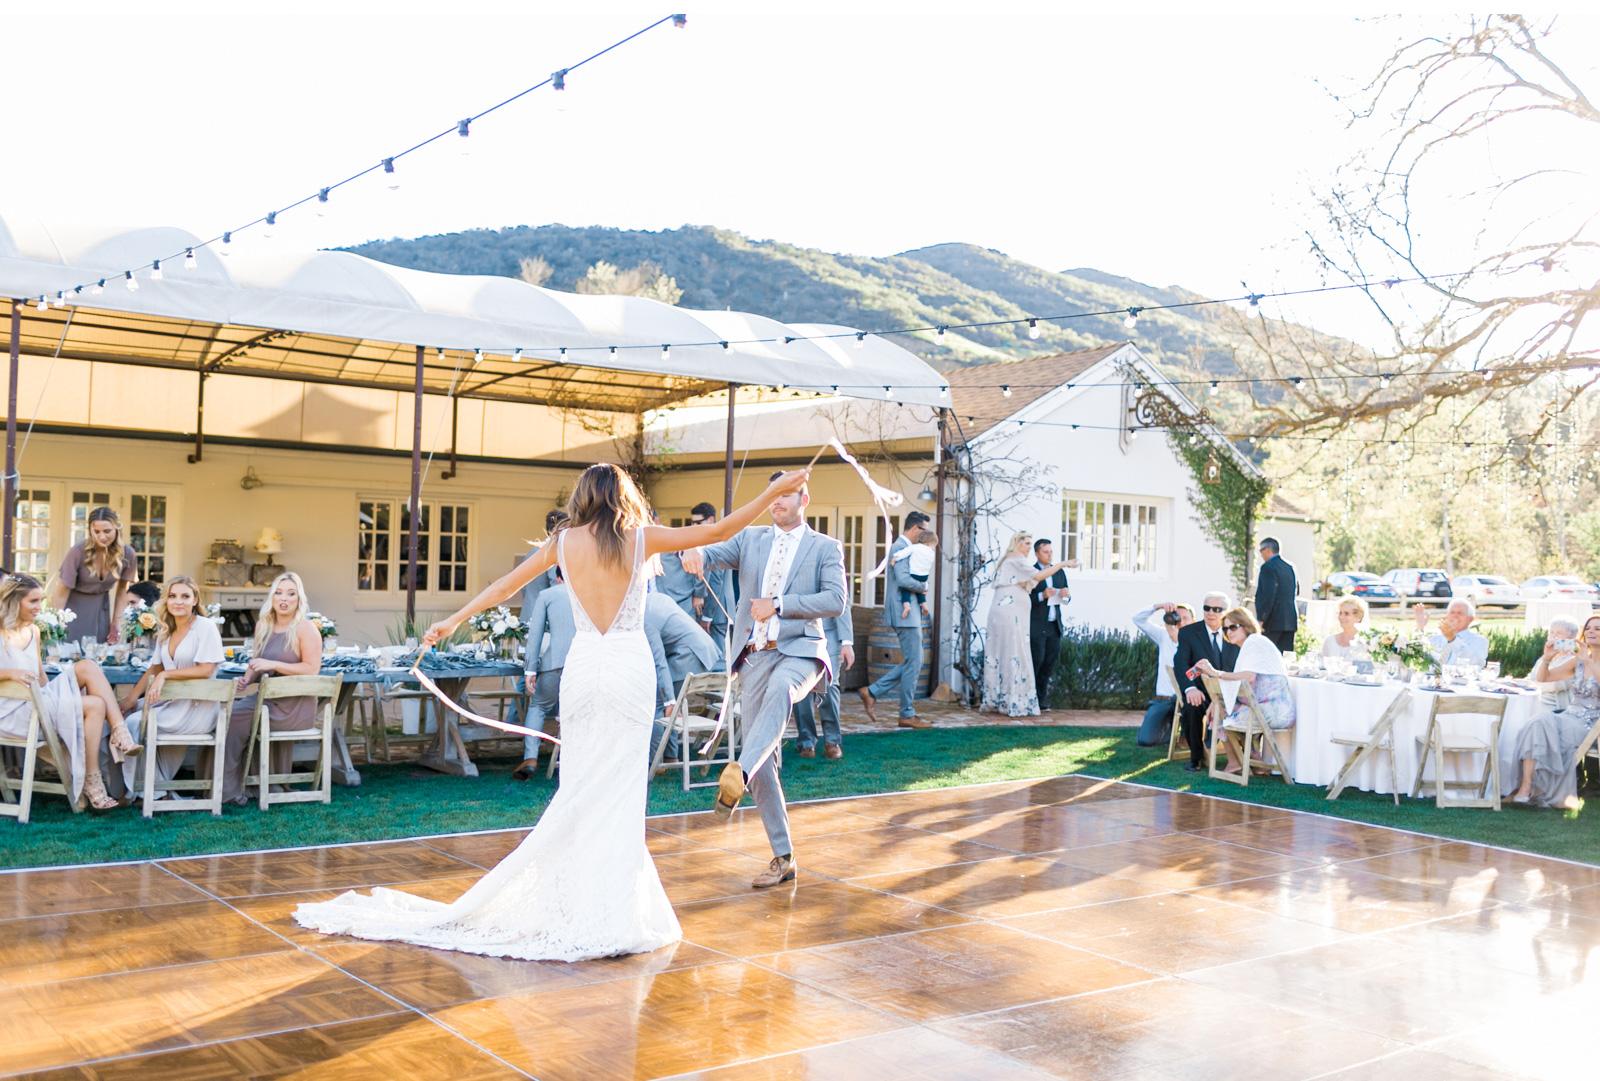 Triunfo-Creek-Malibu-Wedding-Natalie-Schutt-Photography-Couture-Events-Style-Me-Pretty_08.jpg